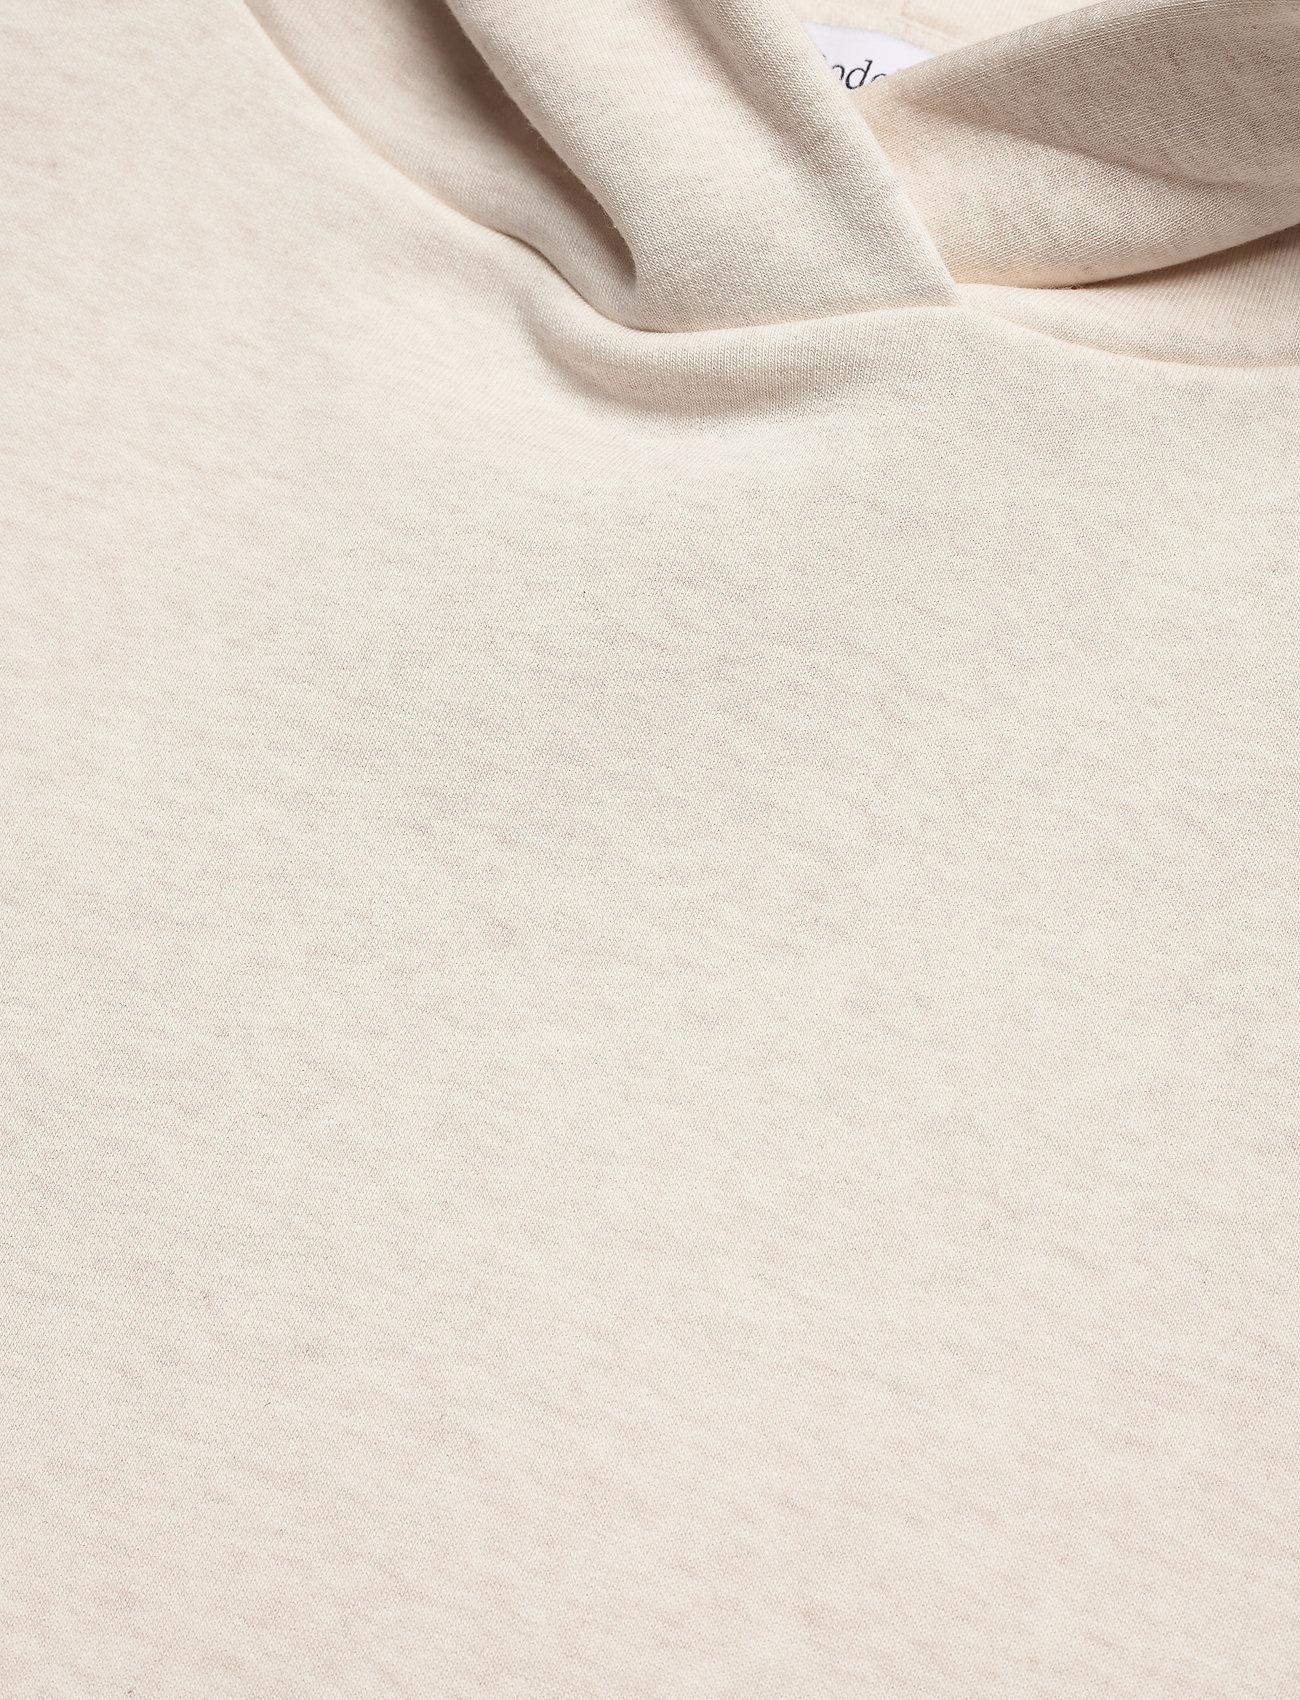 RODEBJER - RODEBJER MONOGRAM - sweatshirts & hættetrøjer - puffy white - 2